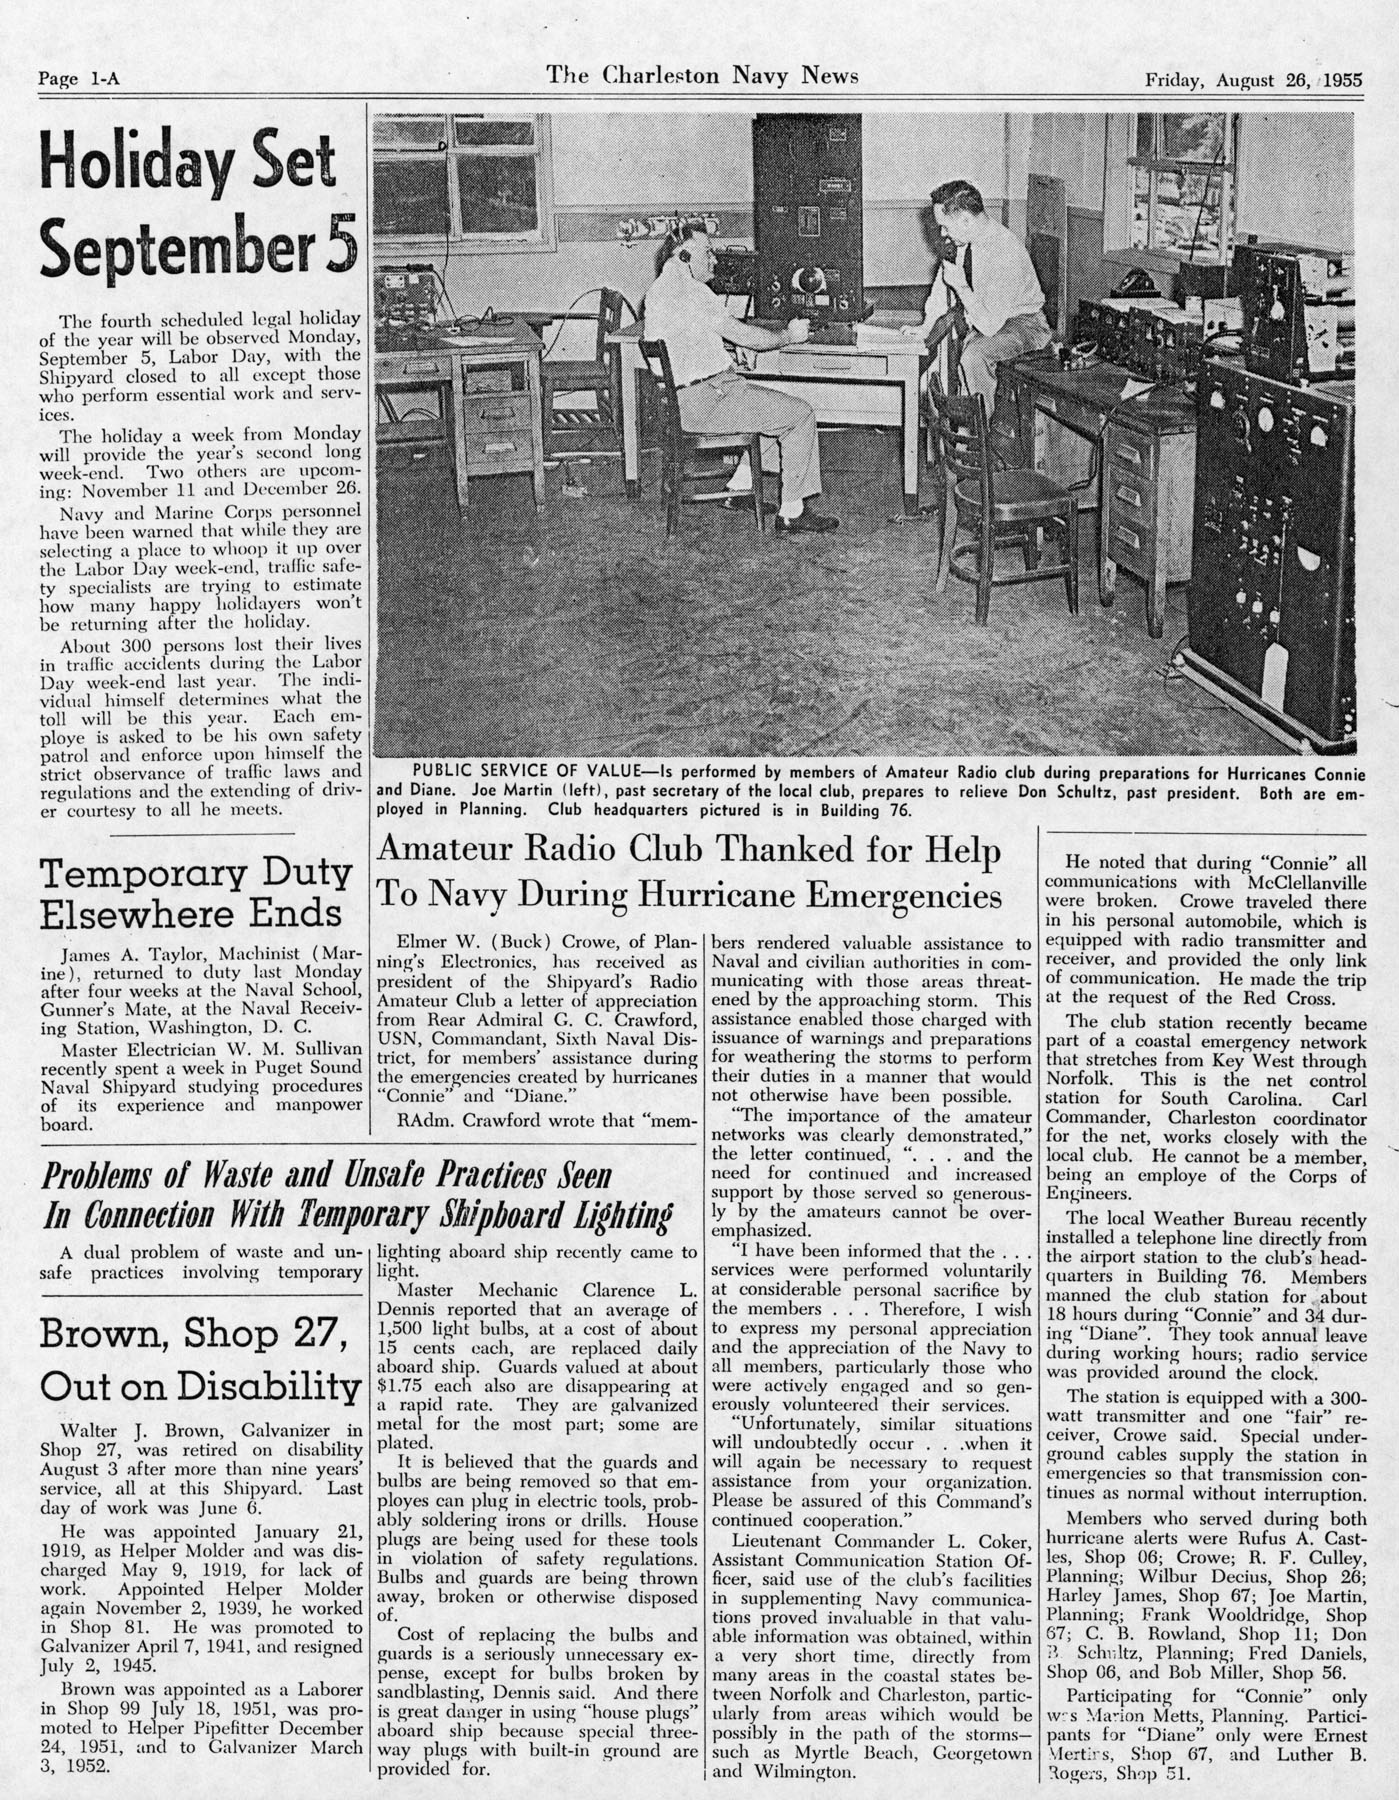 The Charleston Navy News, Volume 14, Edition 3, page ia